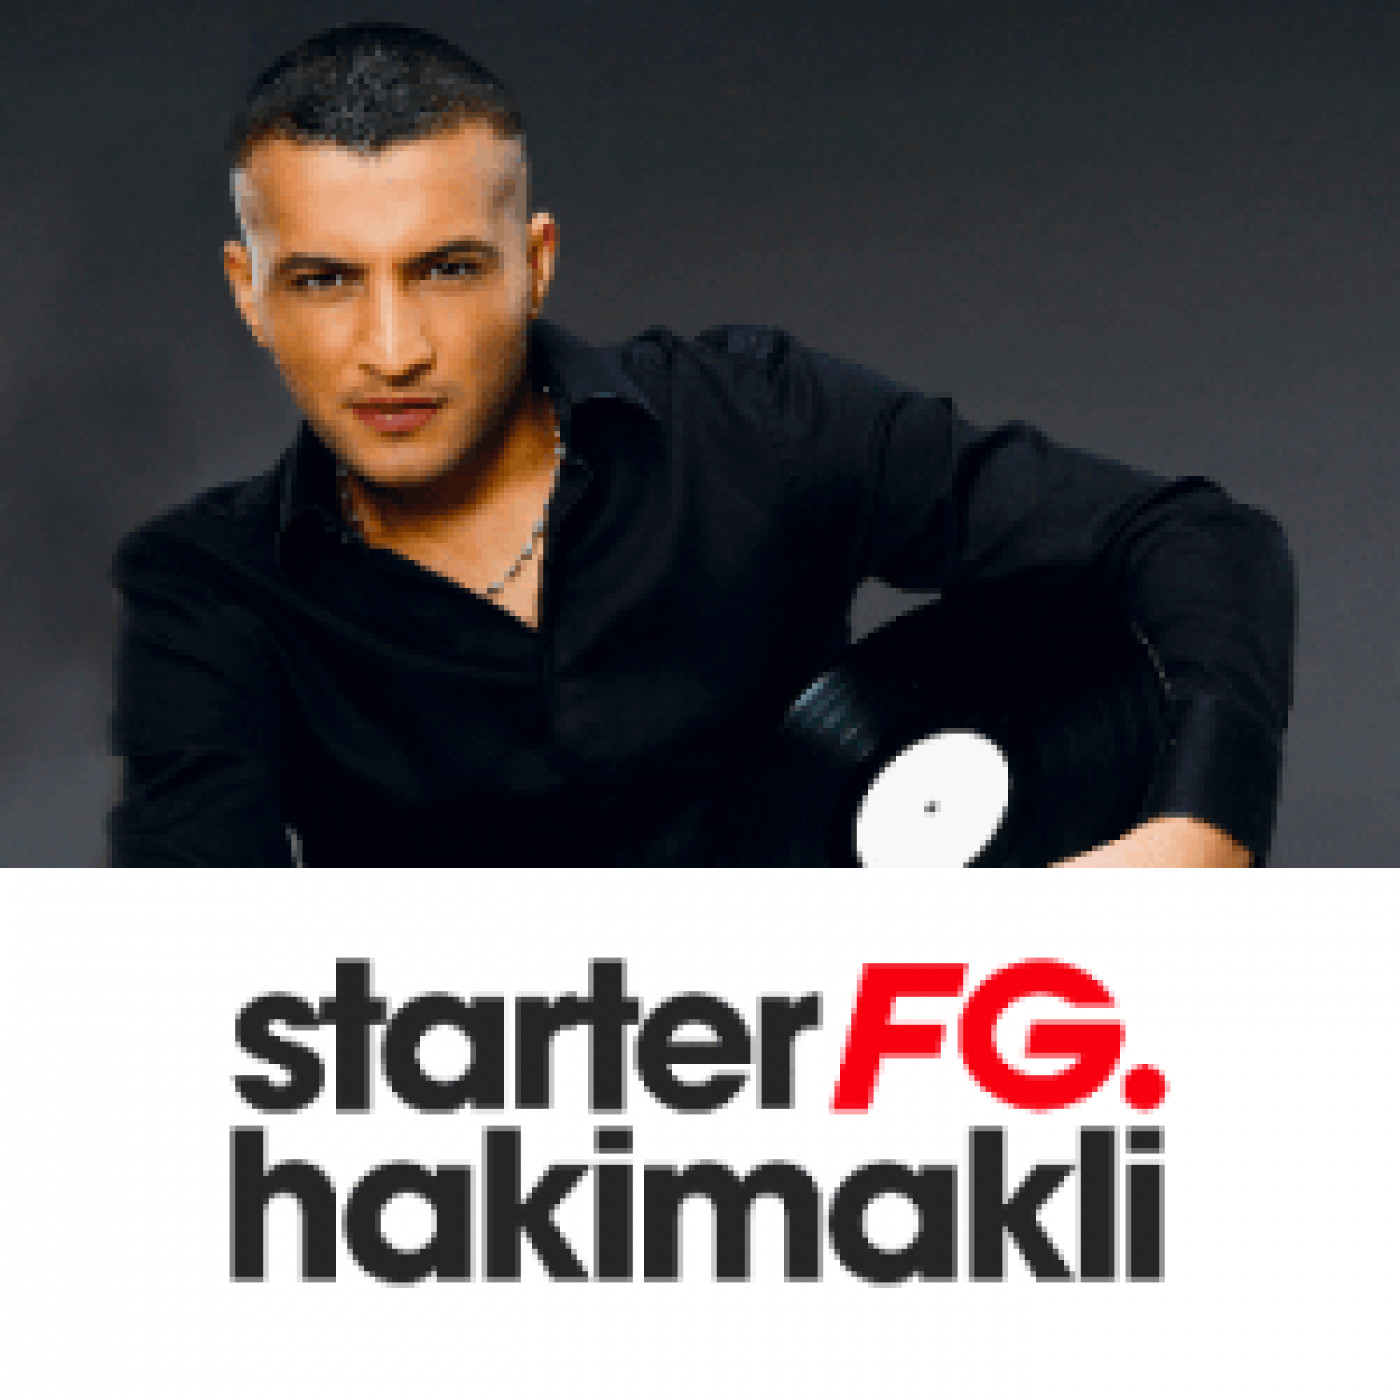 STARTER FG BY HAKIMAKLI JEUDI 26 NOVEMBRE 2020